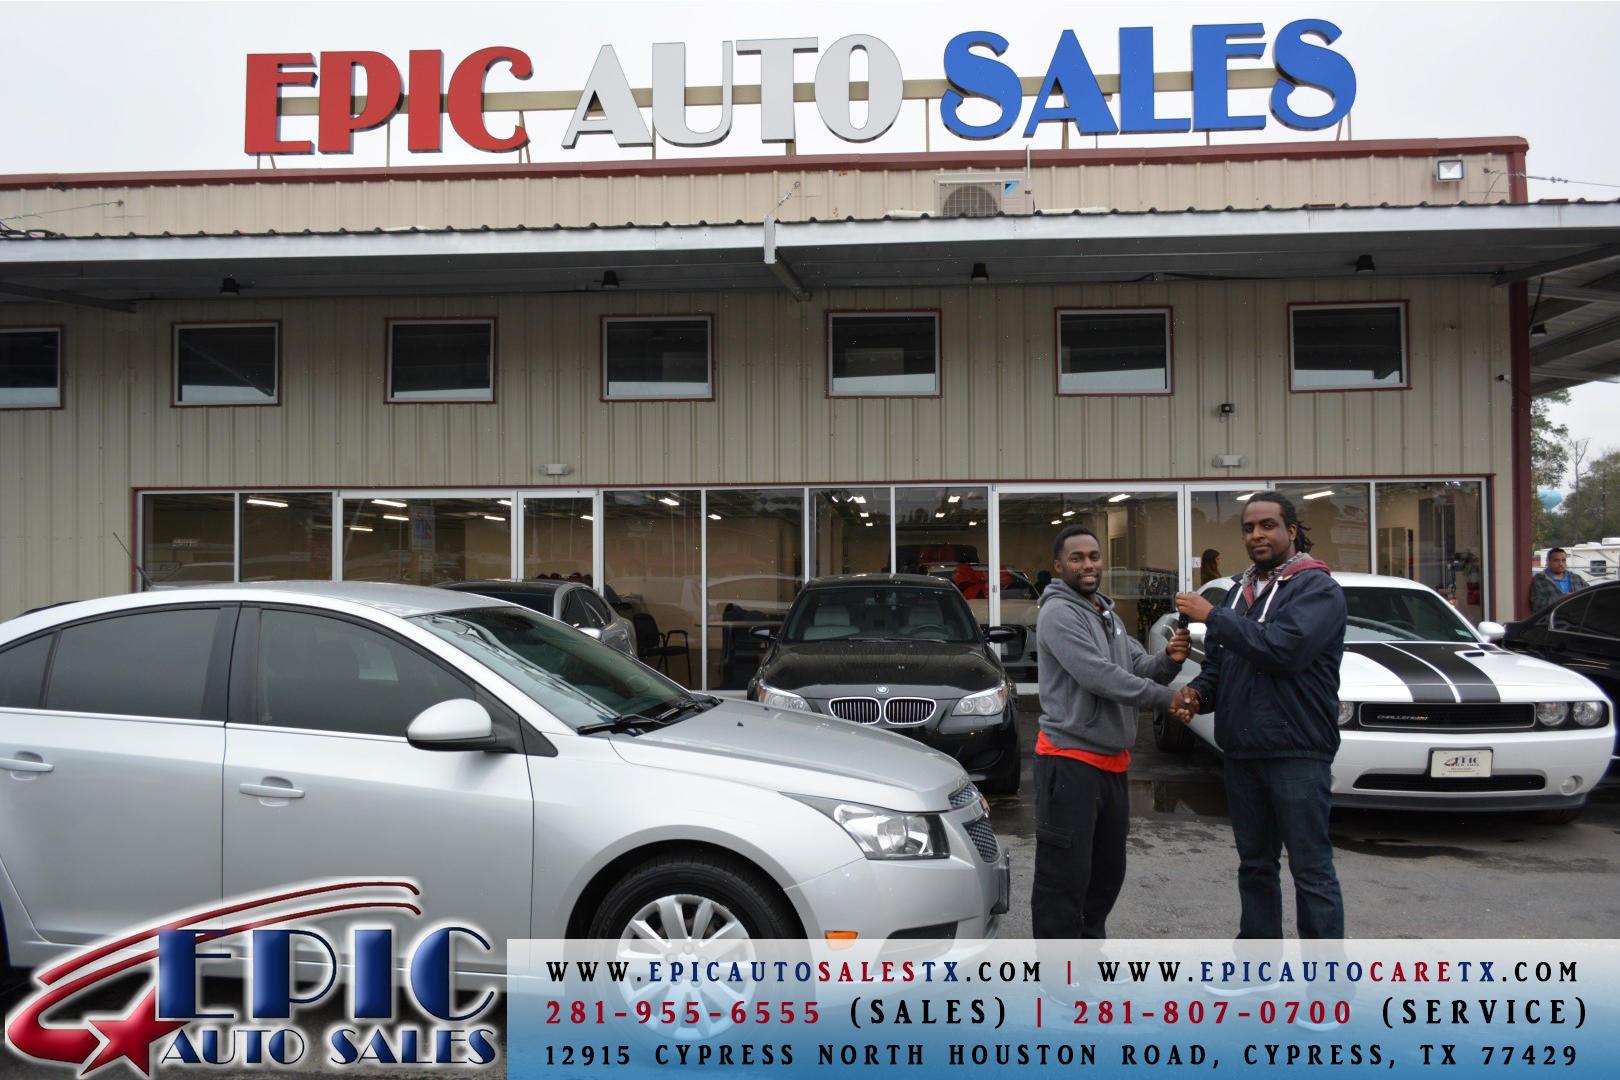 Epic Auto Sales image 17